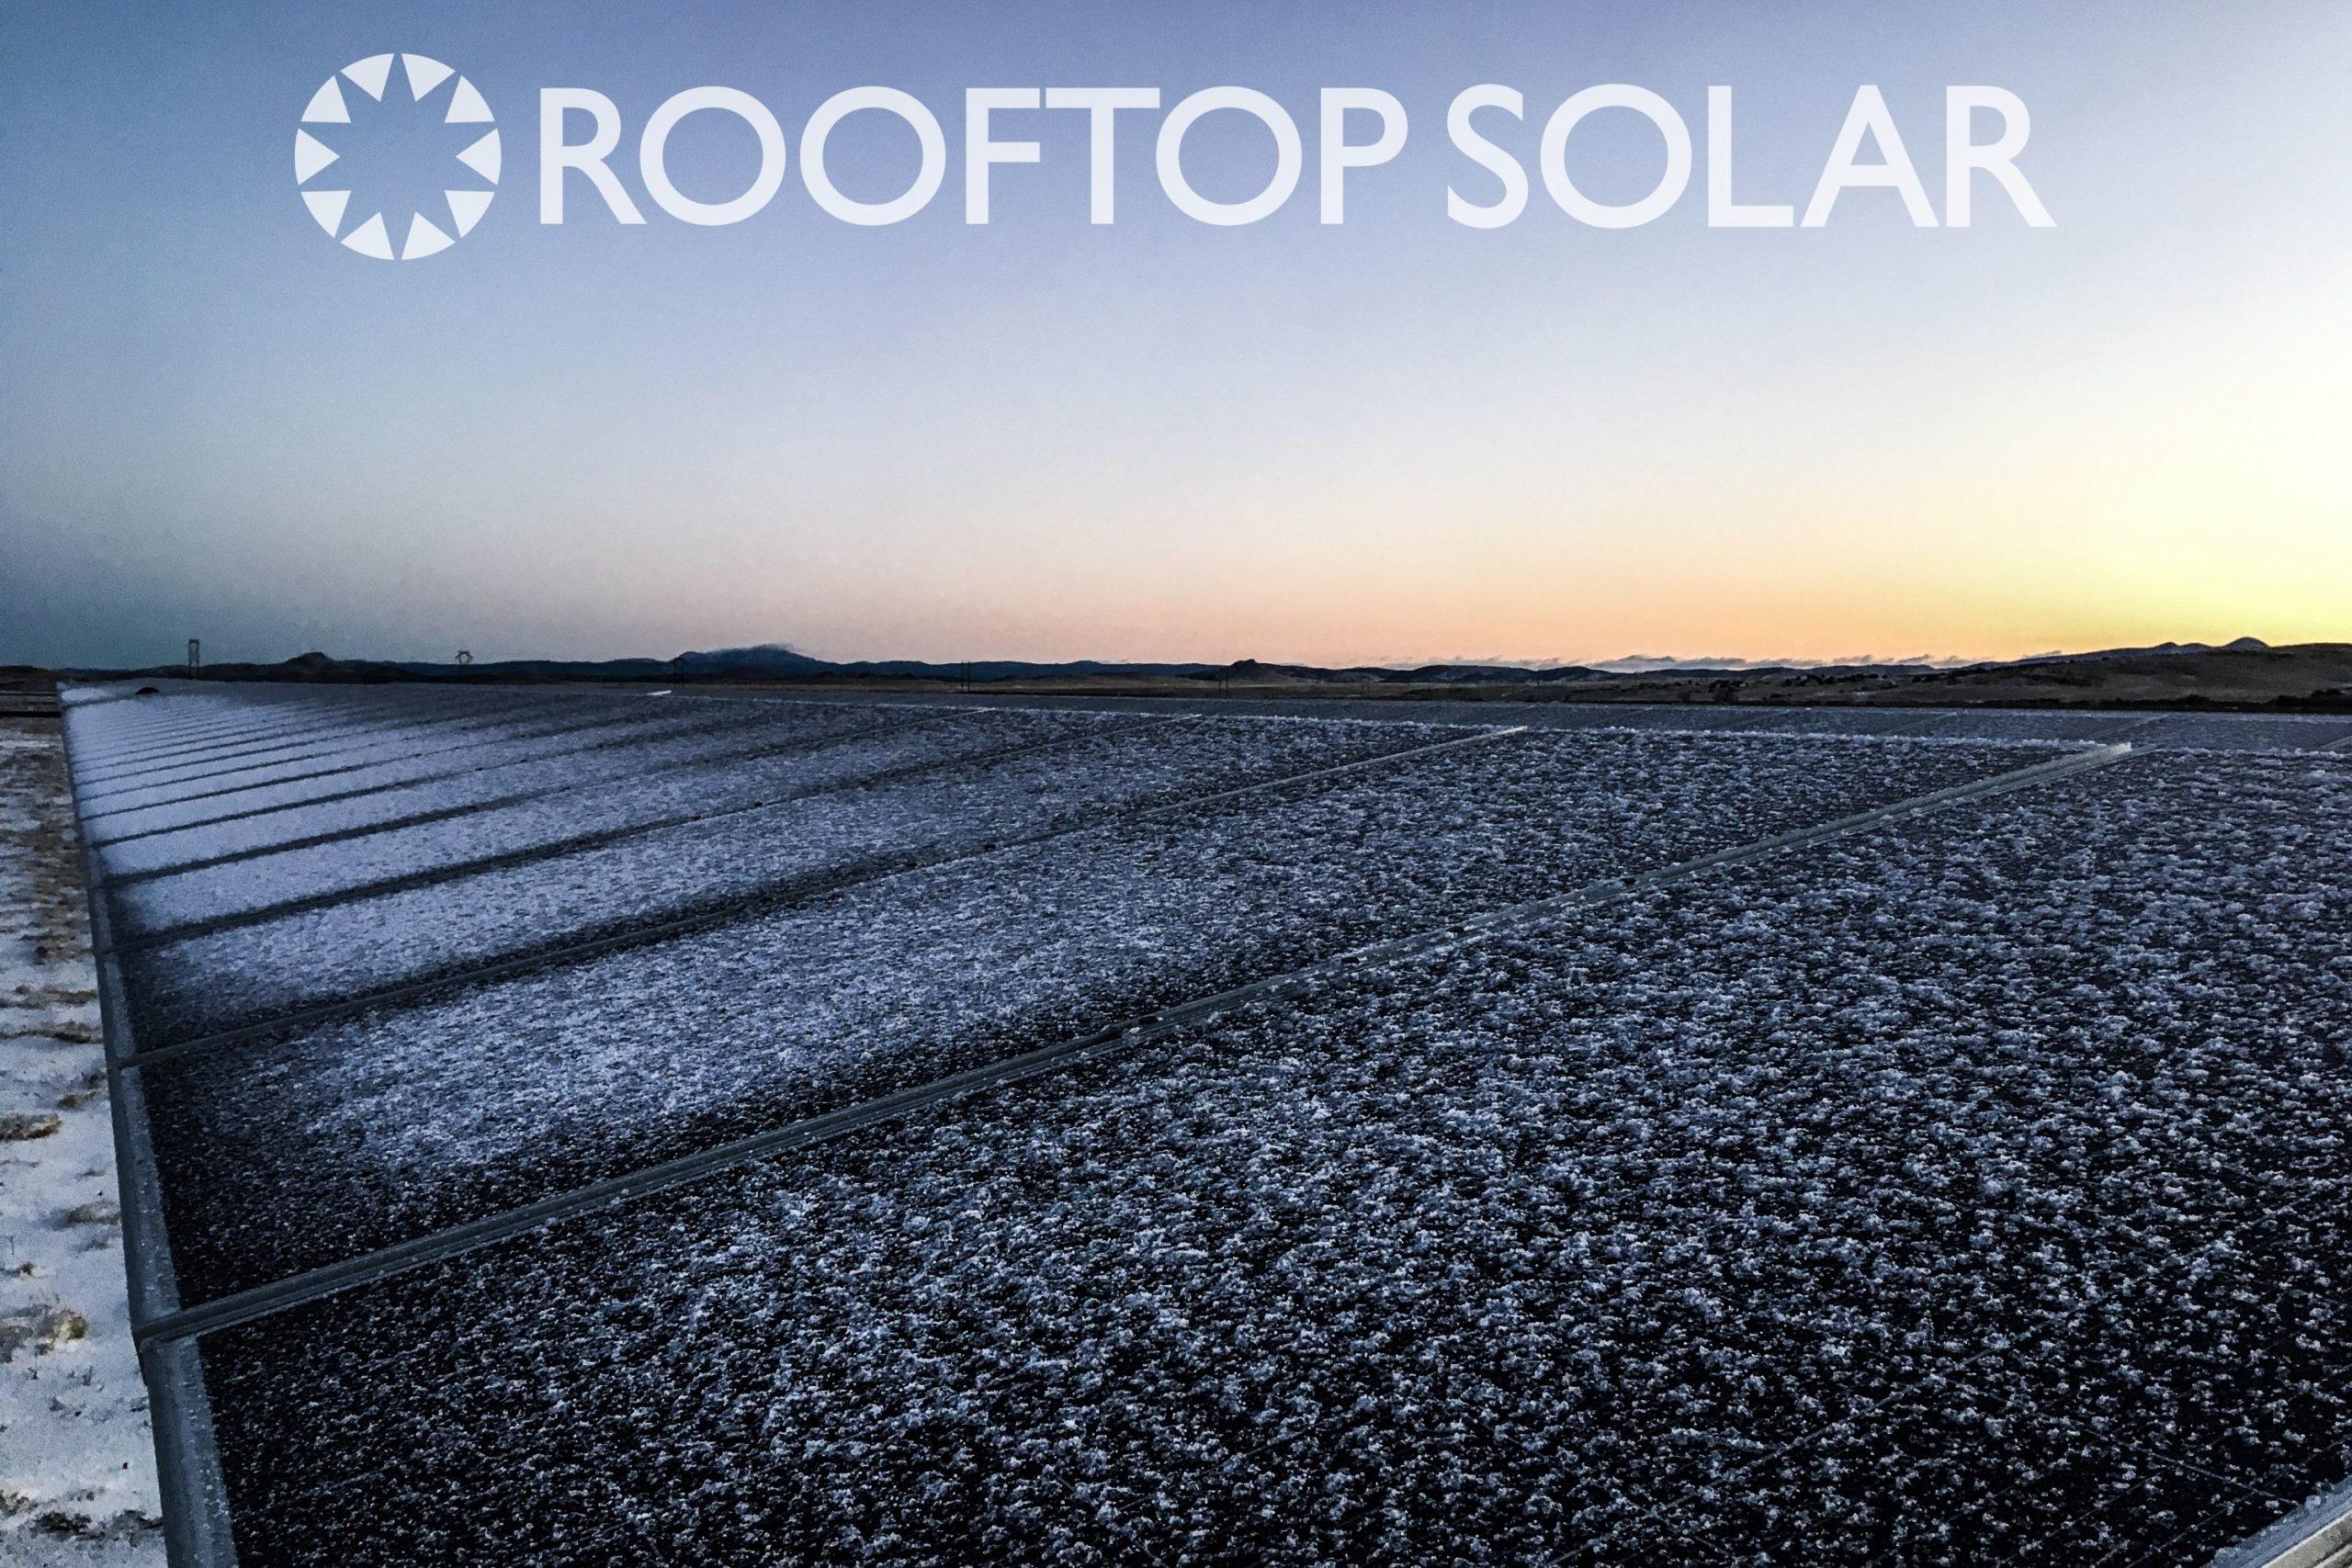 snowy solar panels